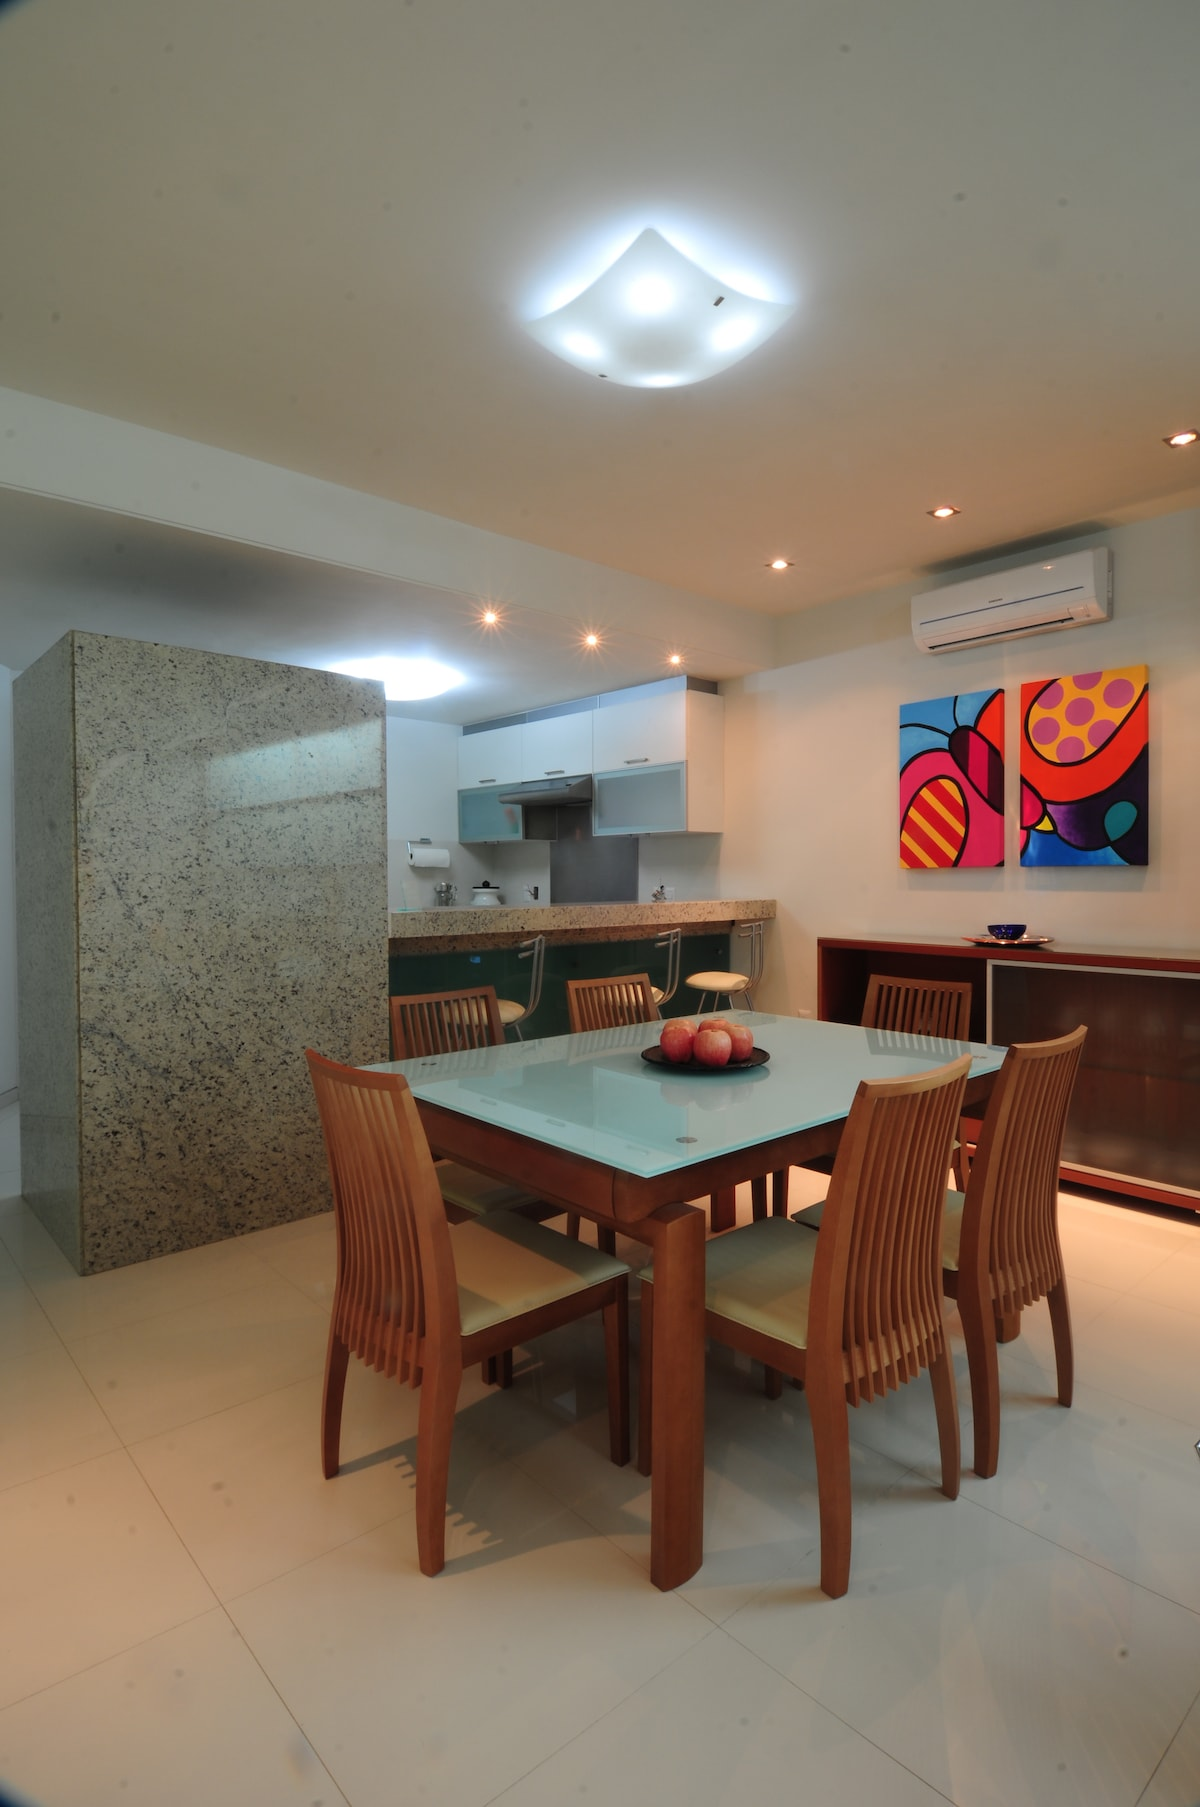 Kubo Suites Suite A De Lujo Apartments For Rent In San